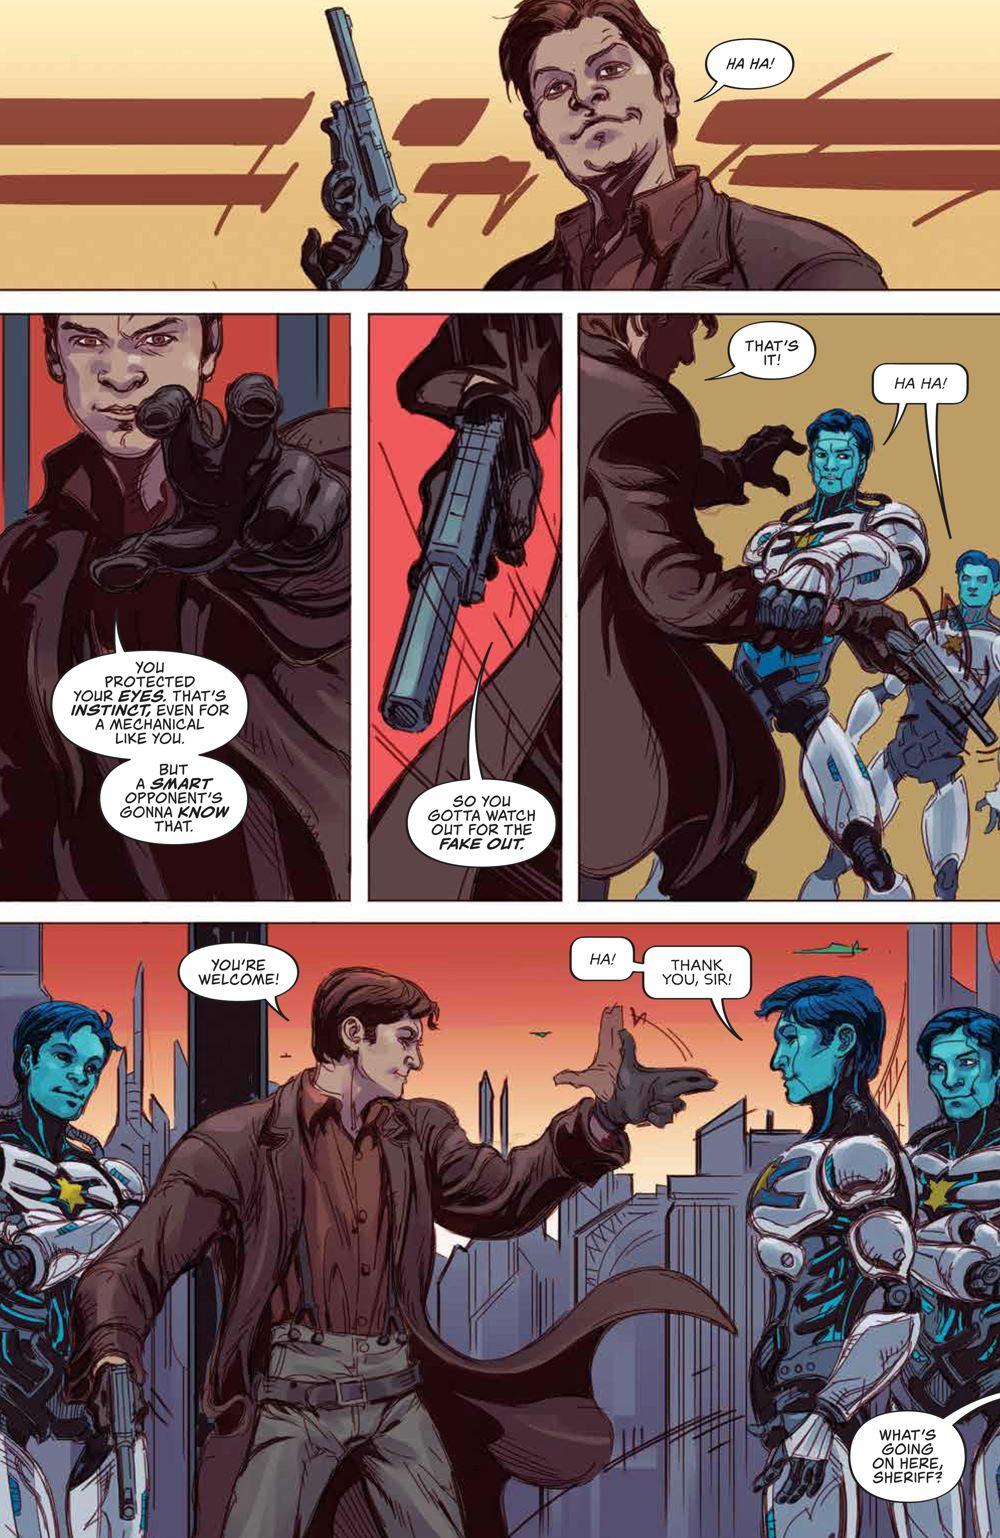 Firefly_BlueSunRising_v2_HC_23 ComicList Previews: FIREFLY BLUE SUN RISING VOLUME 2 HC